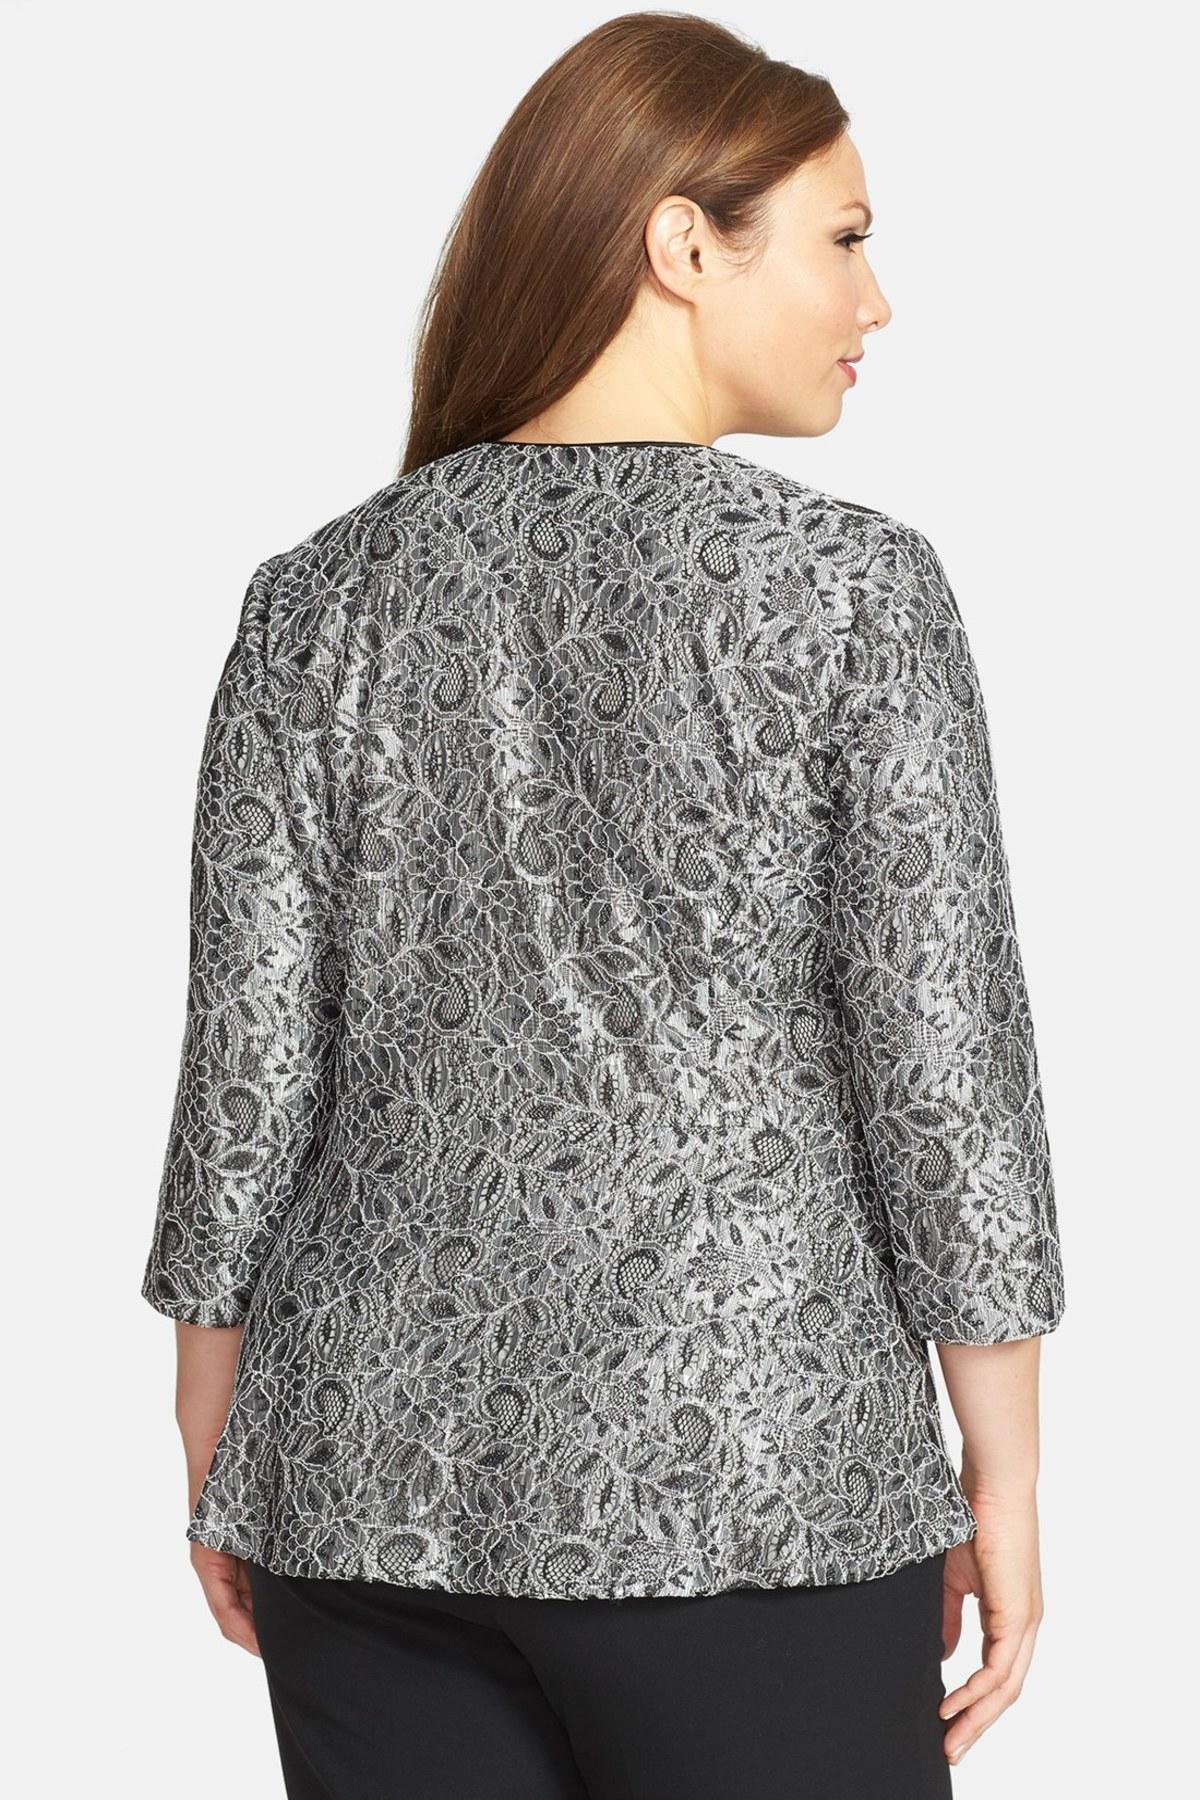 Alex Evenings Collarless Metallic Lace Jacket Plus Size